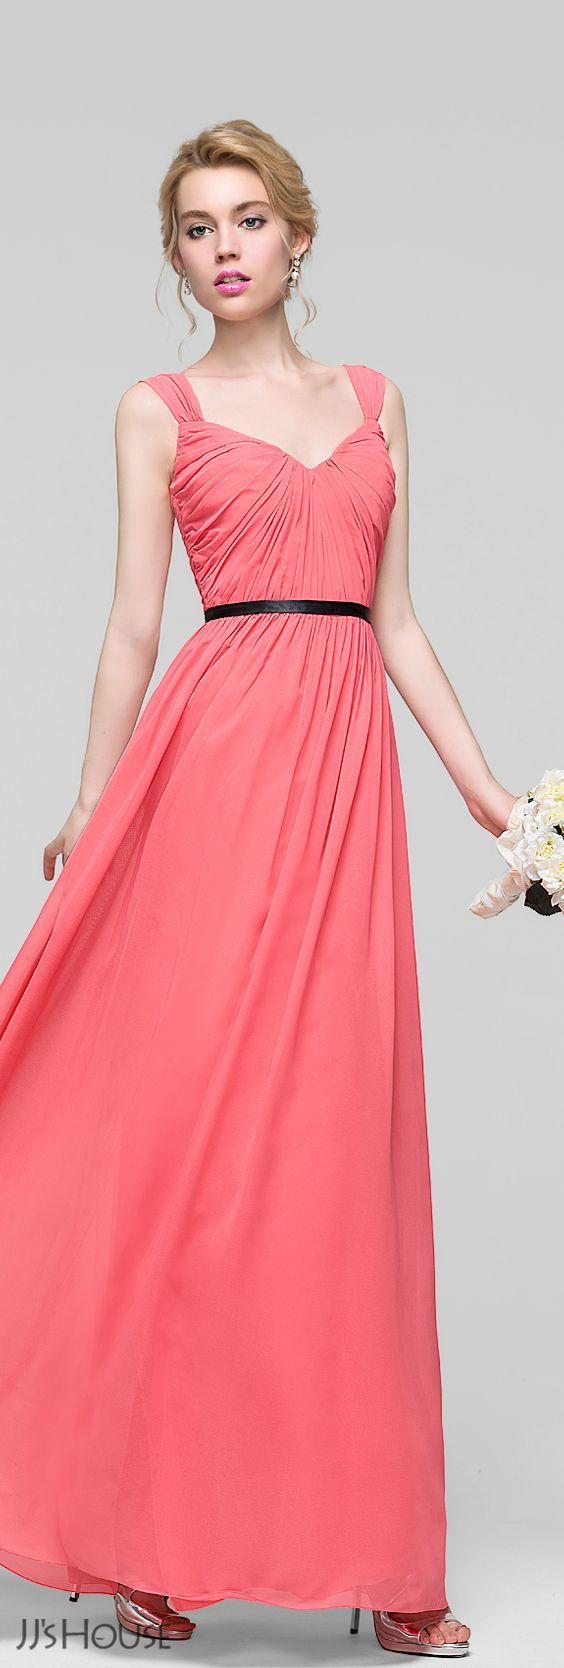 239 best JJs House images on Pinterest | Mothers dresses, Evening ...